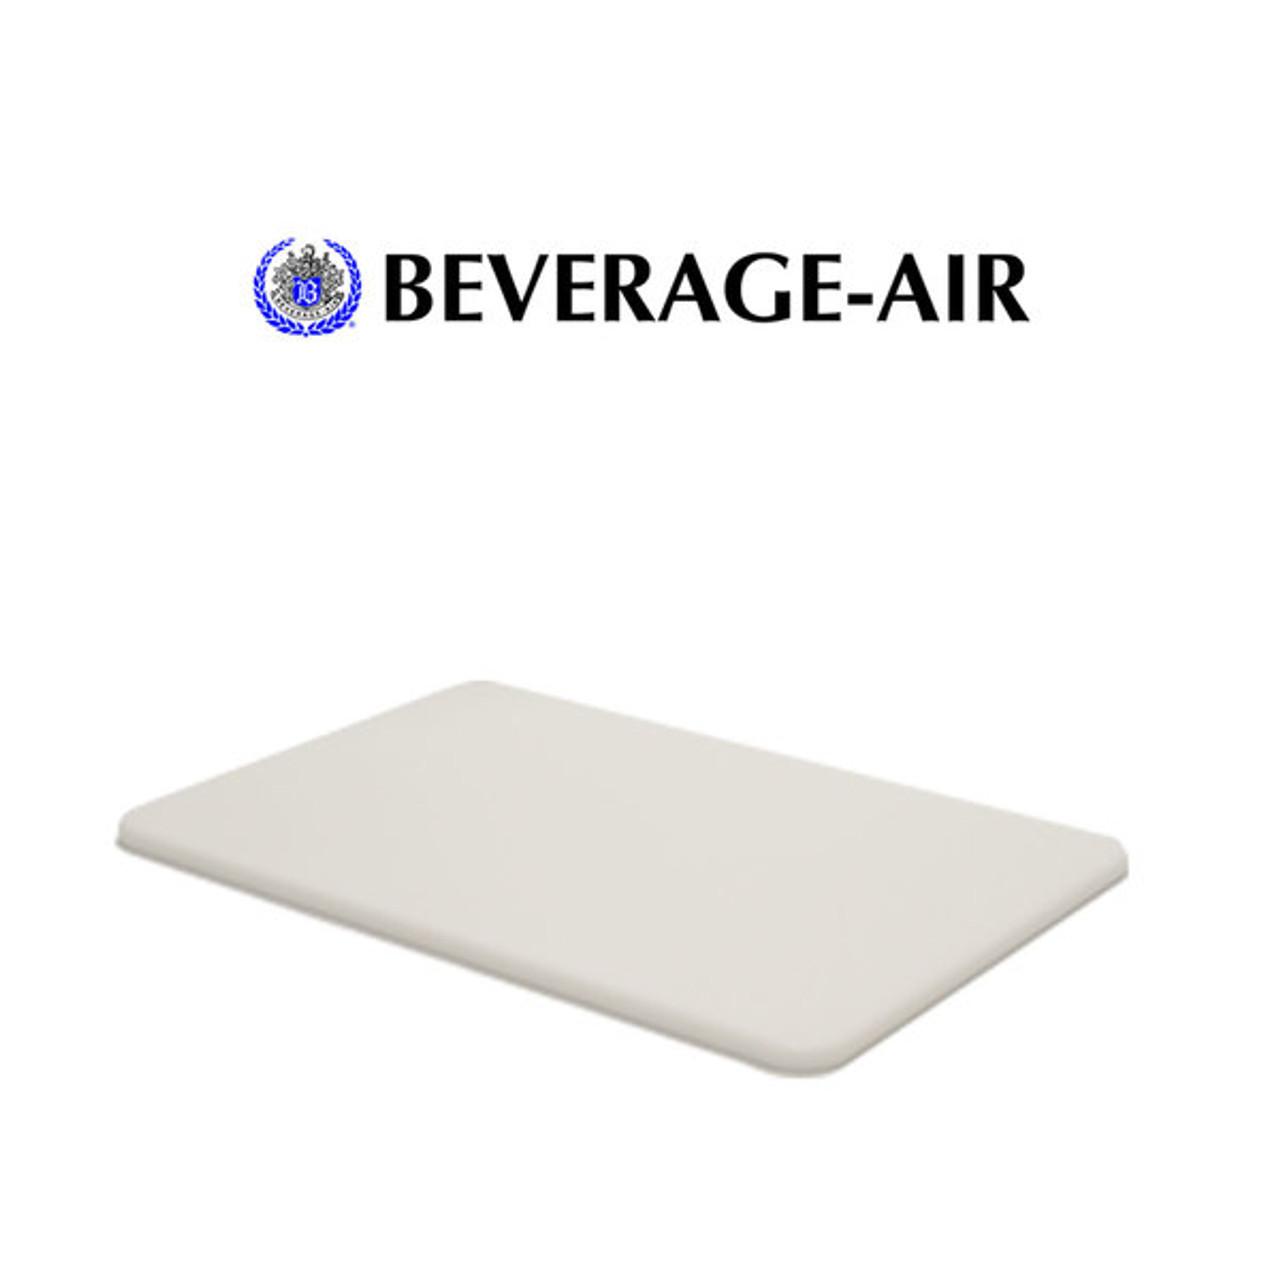 OEM Cutting Board - Beverage Air - P#: 705-285B